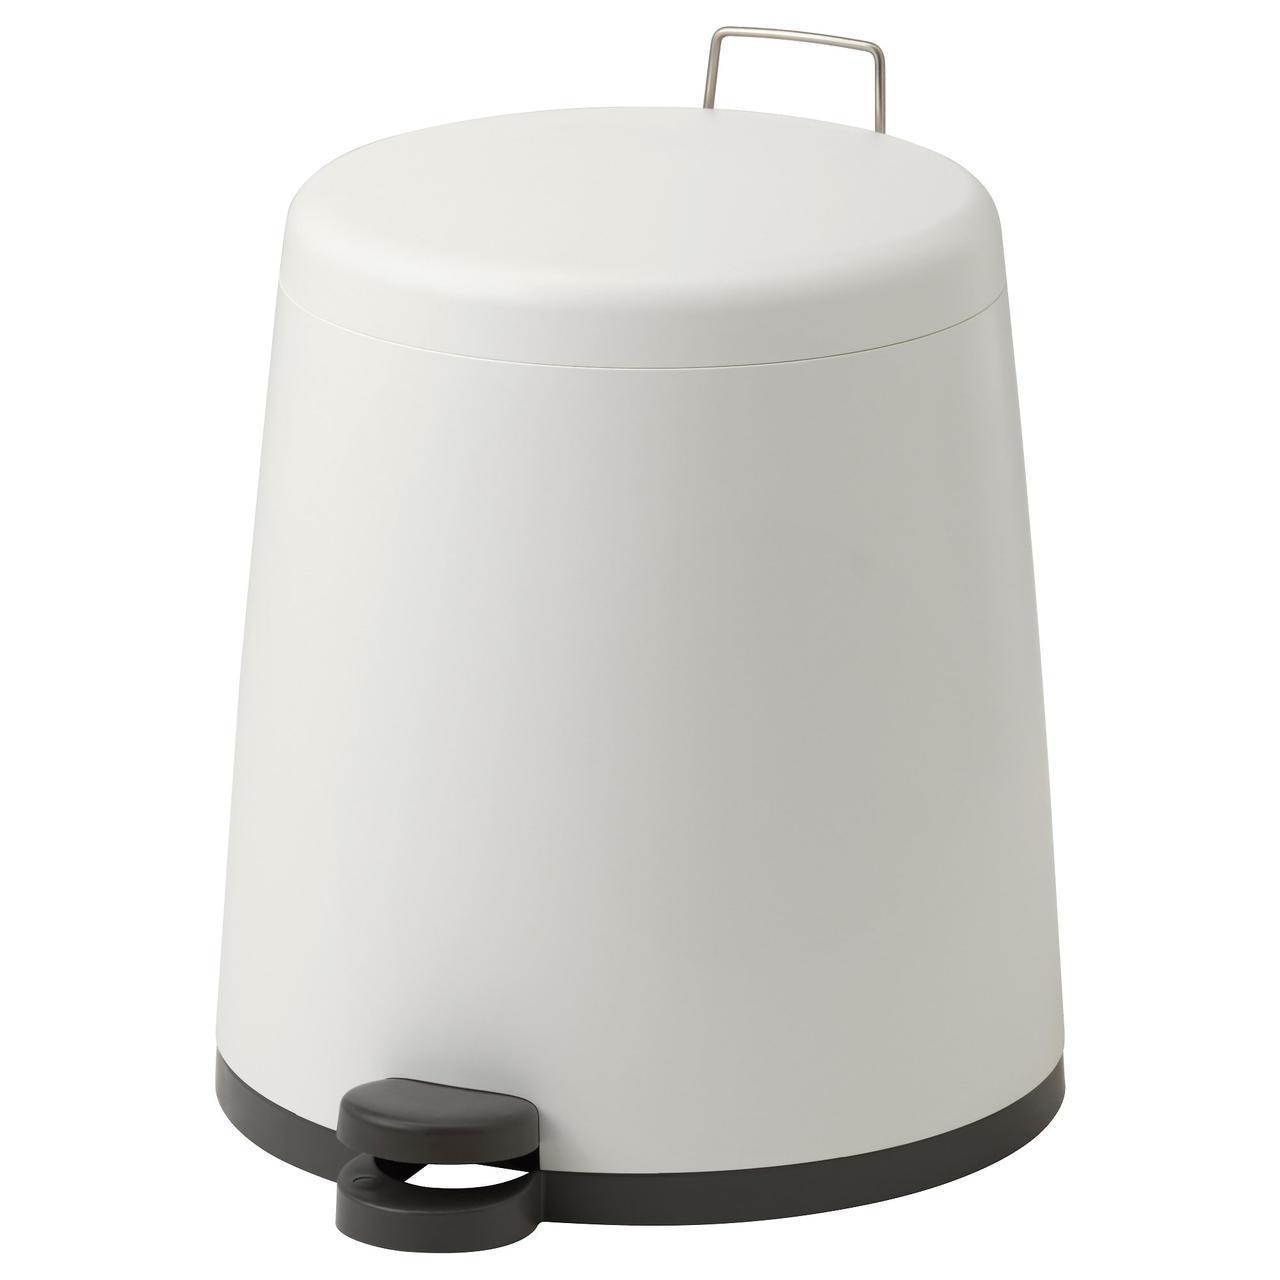 ✅ IKEA SNAPP (902.454.23) Мусорный бак, белый